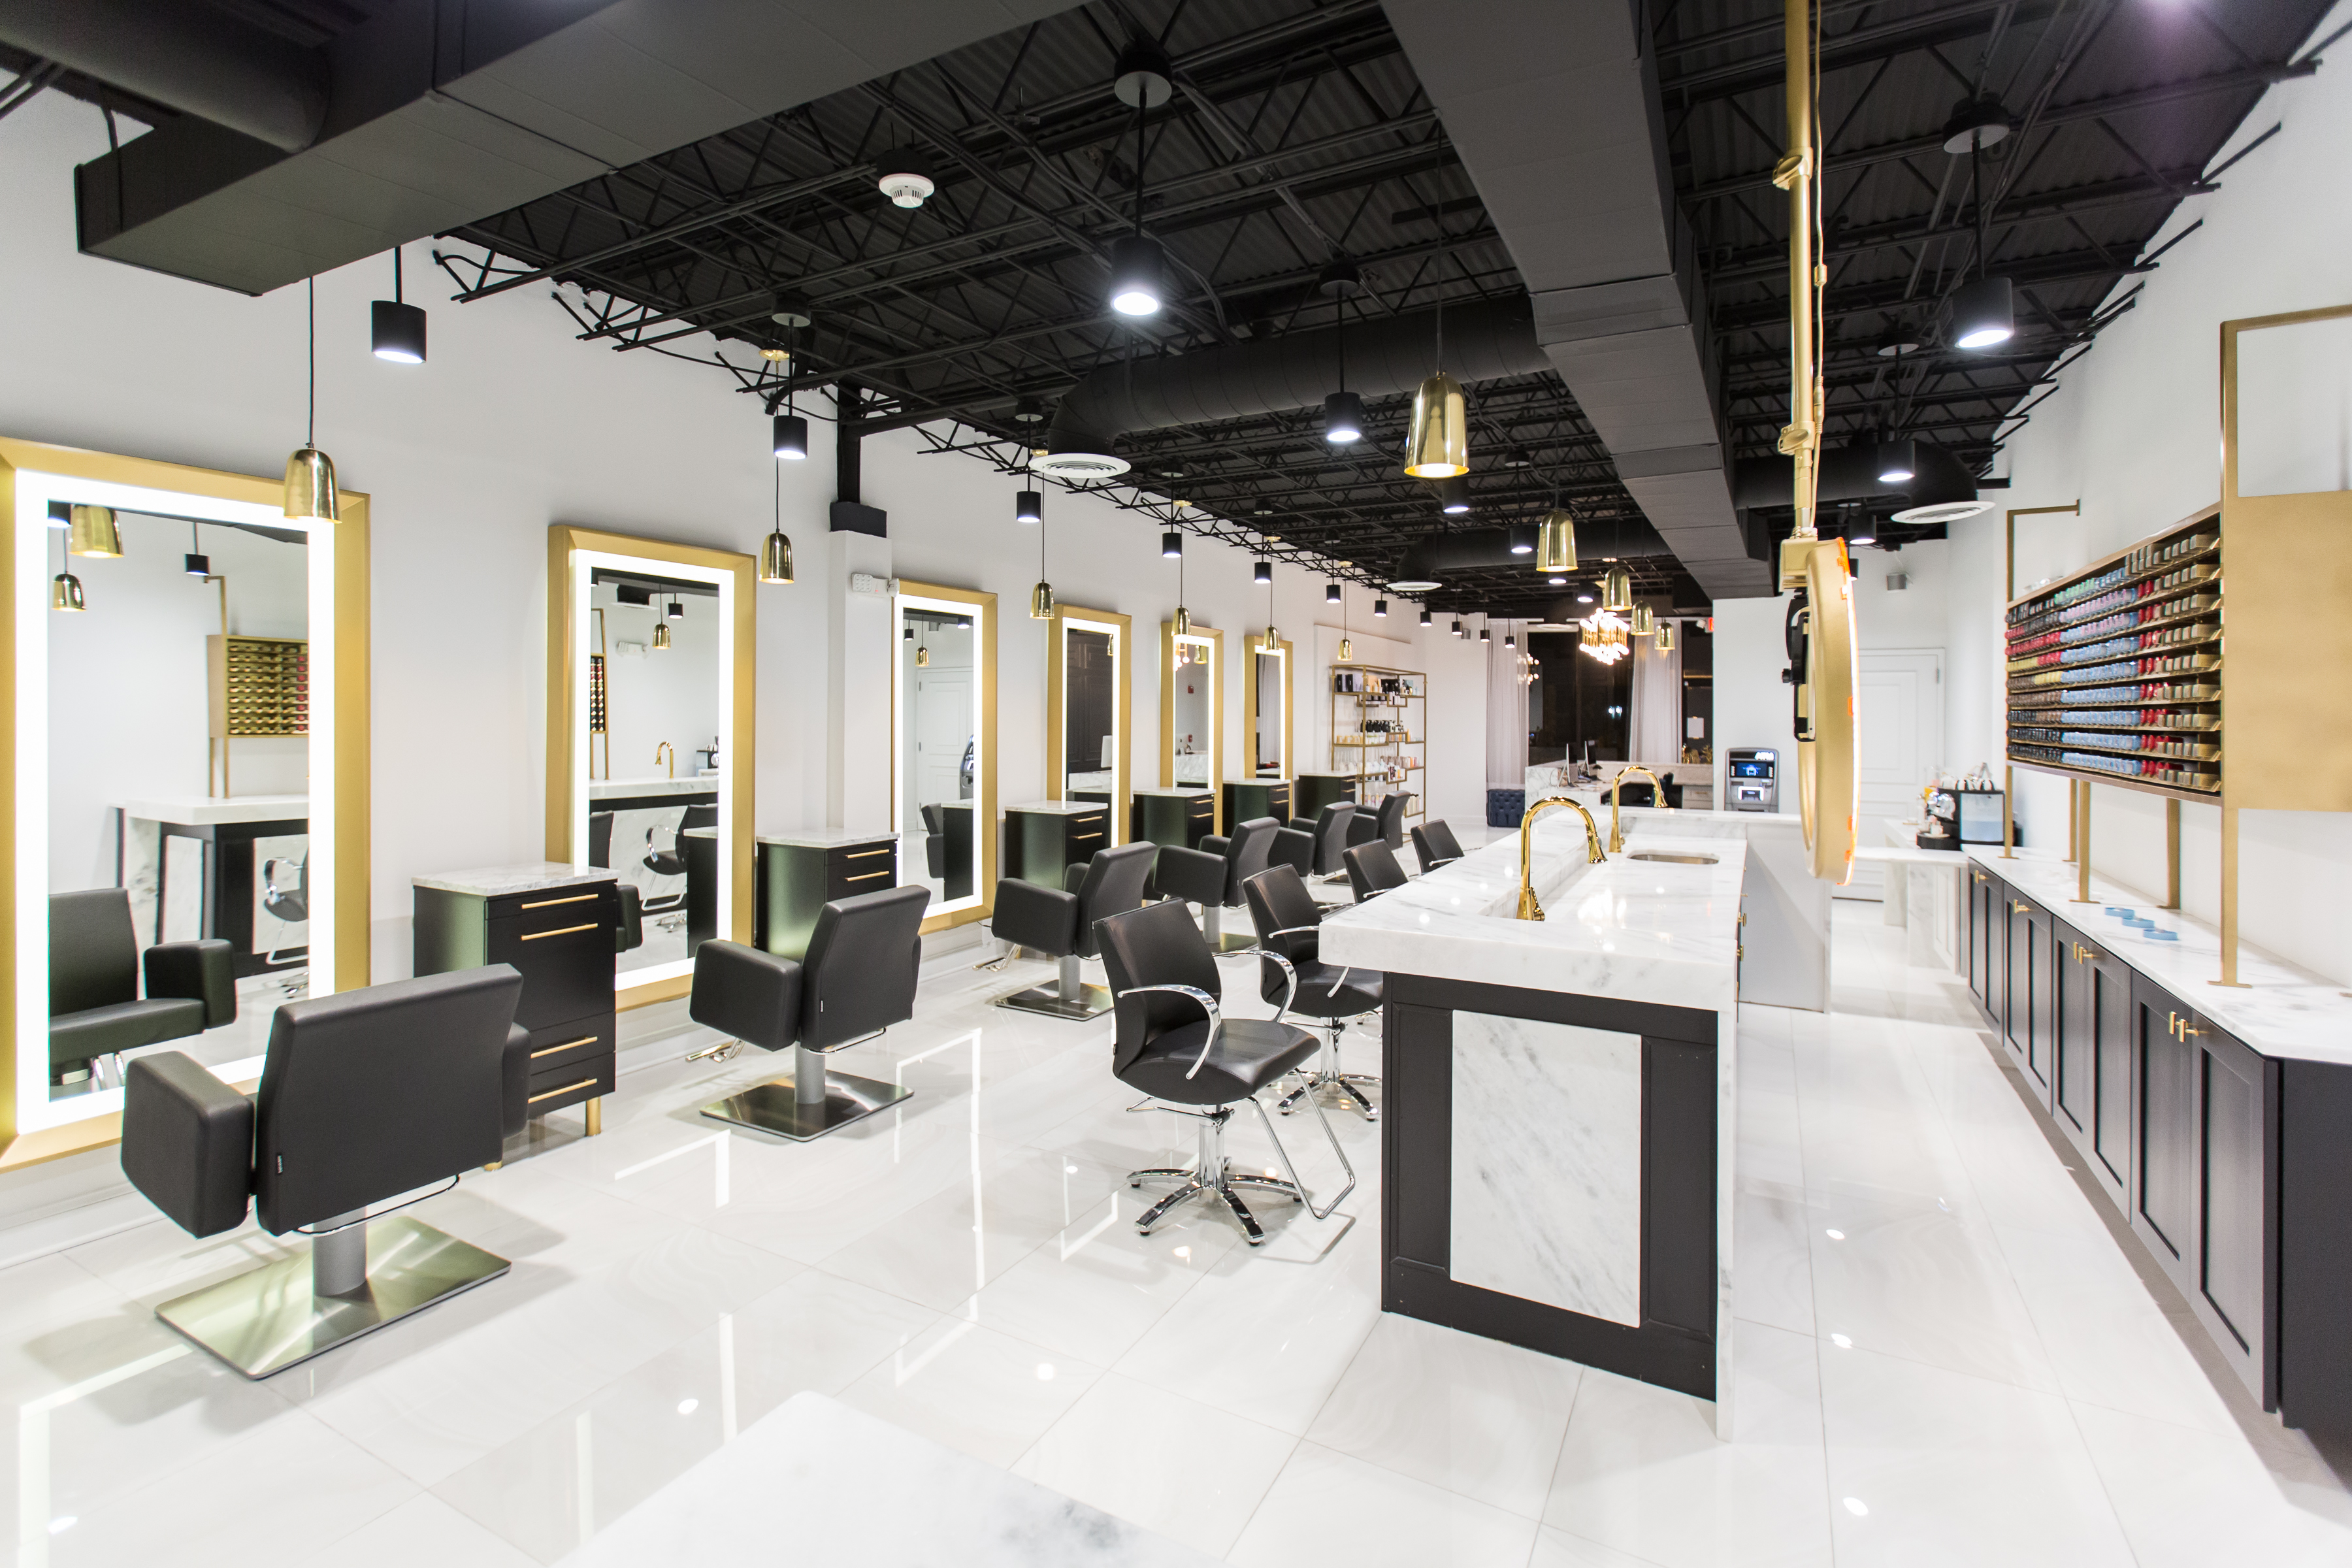 Salons of the Year 2017: Dasi Salon